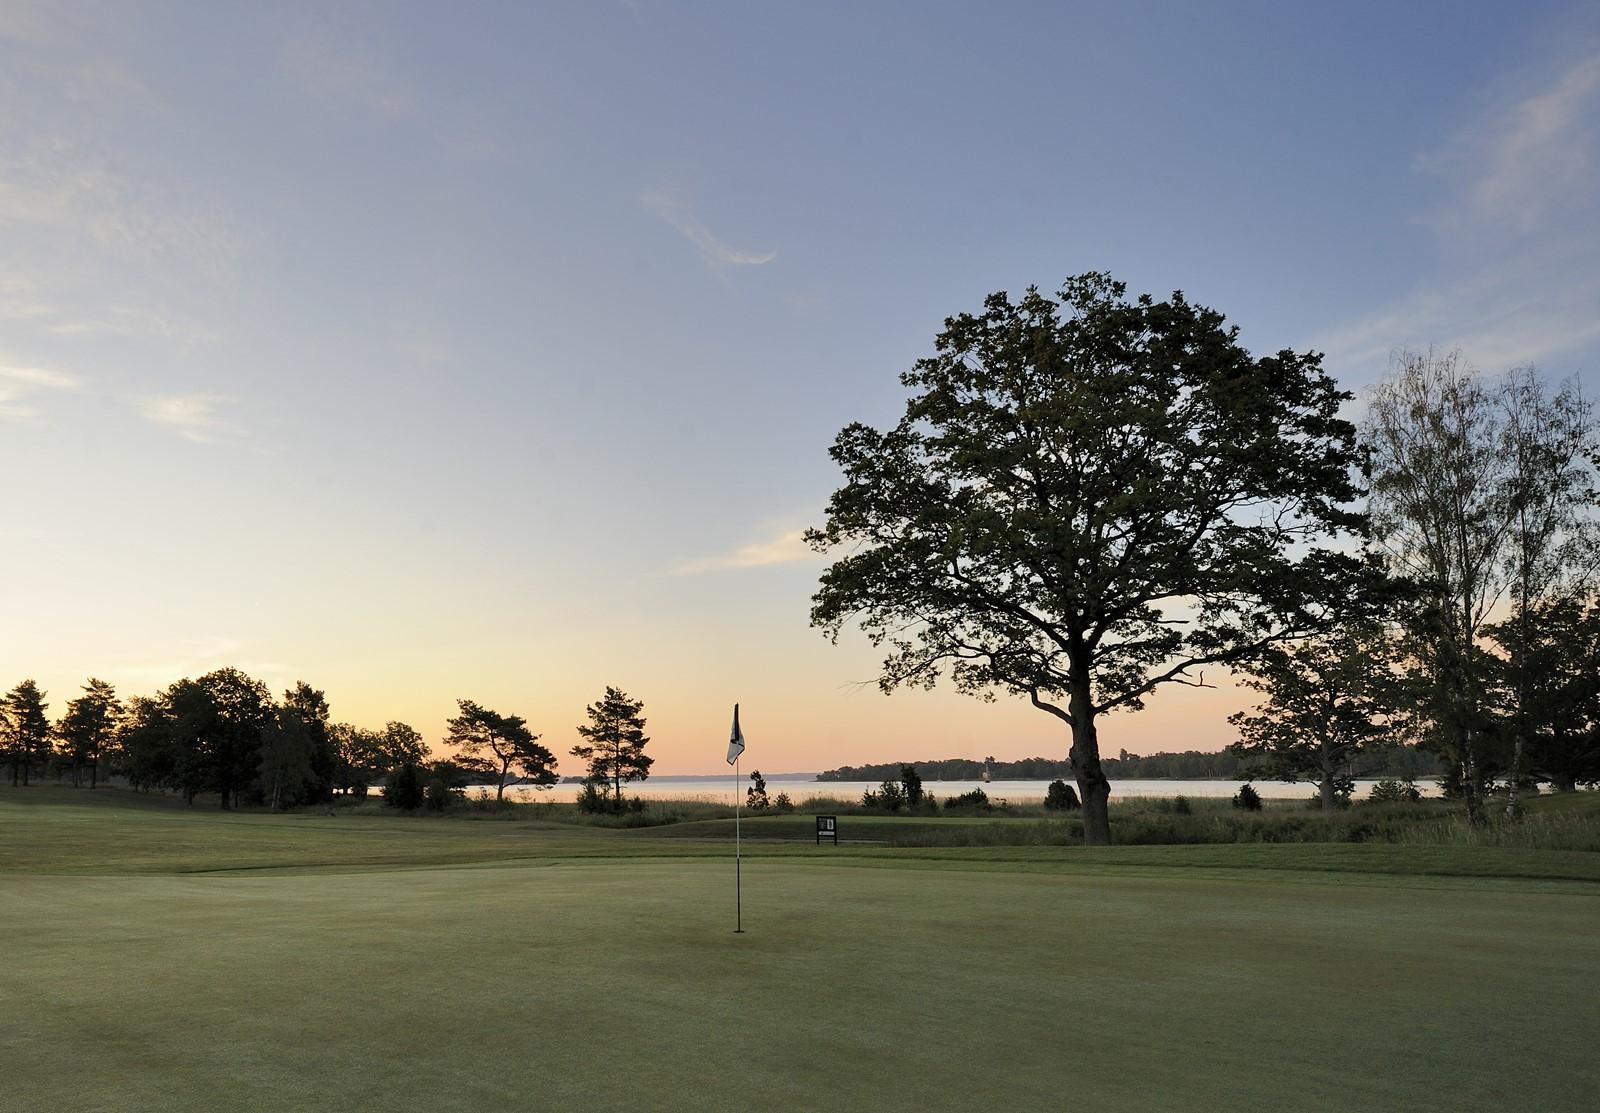 golfbana Kalmar, kalmarsund